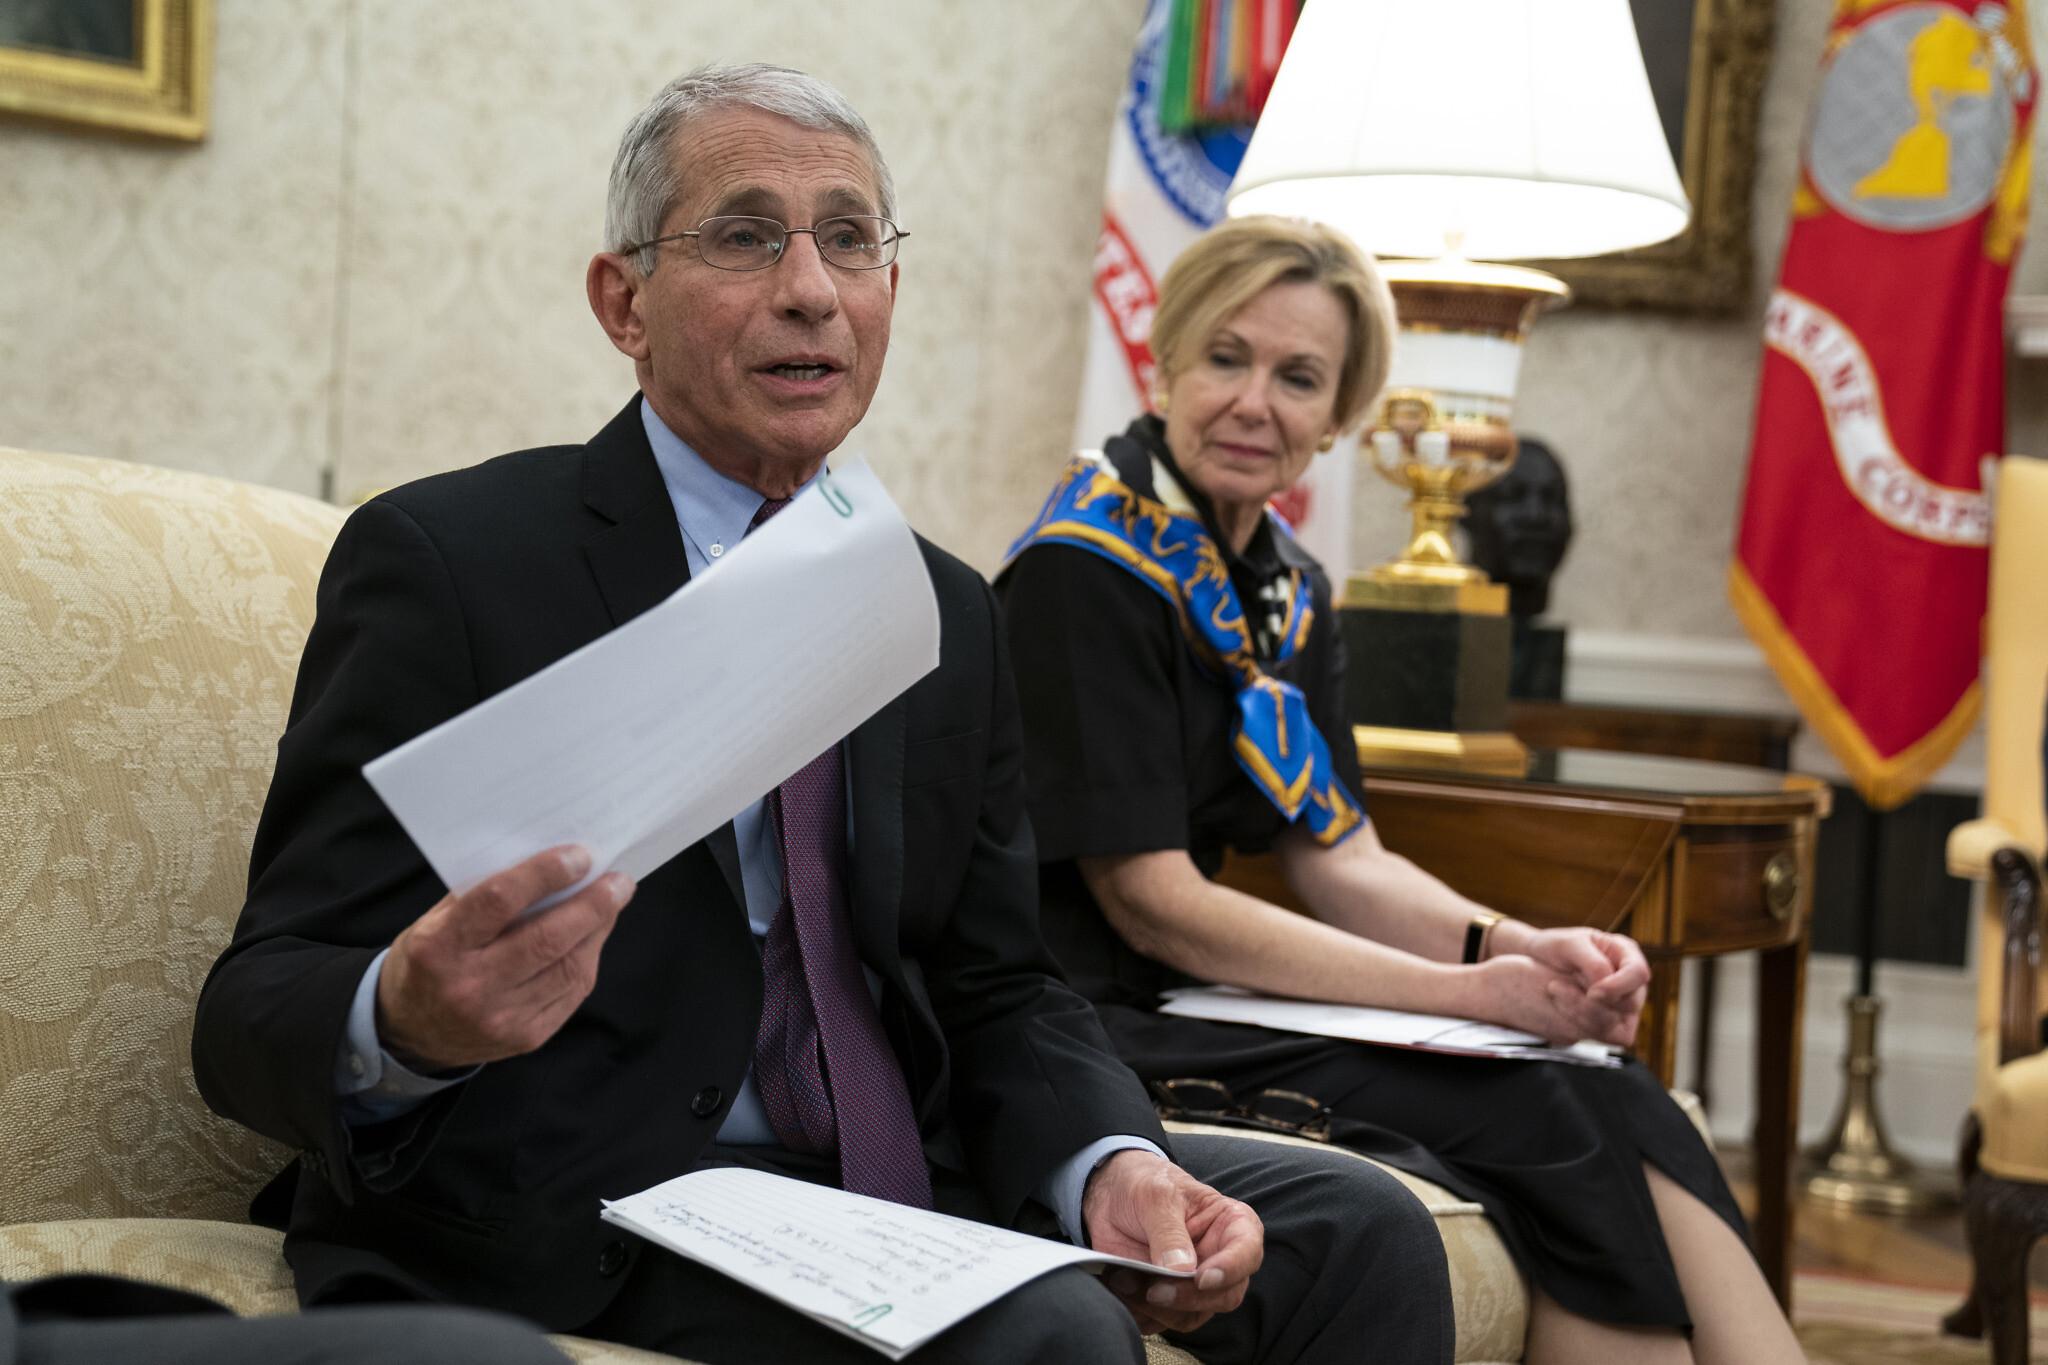 White House blocks Fauci from testifying next week